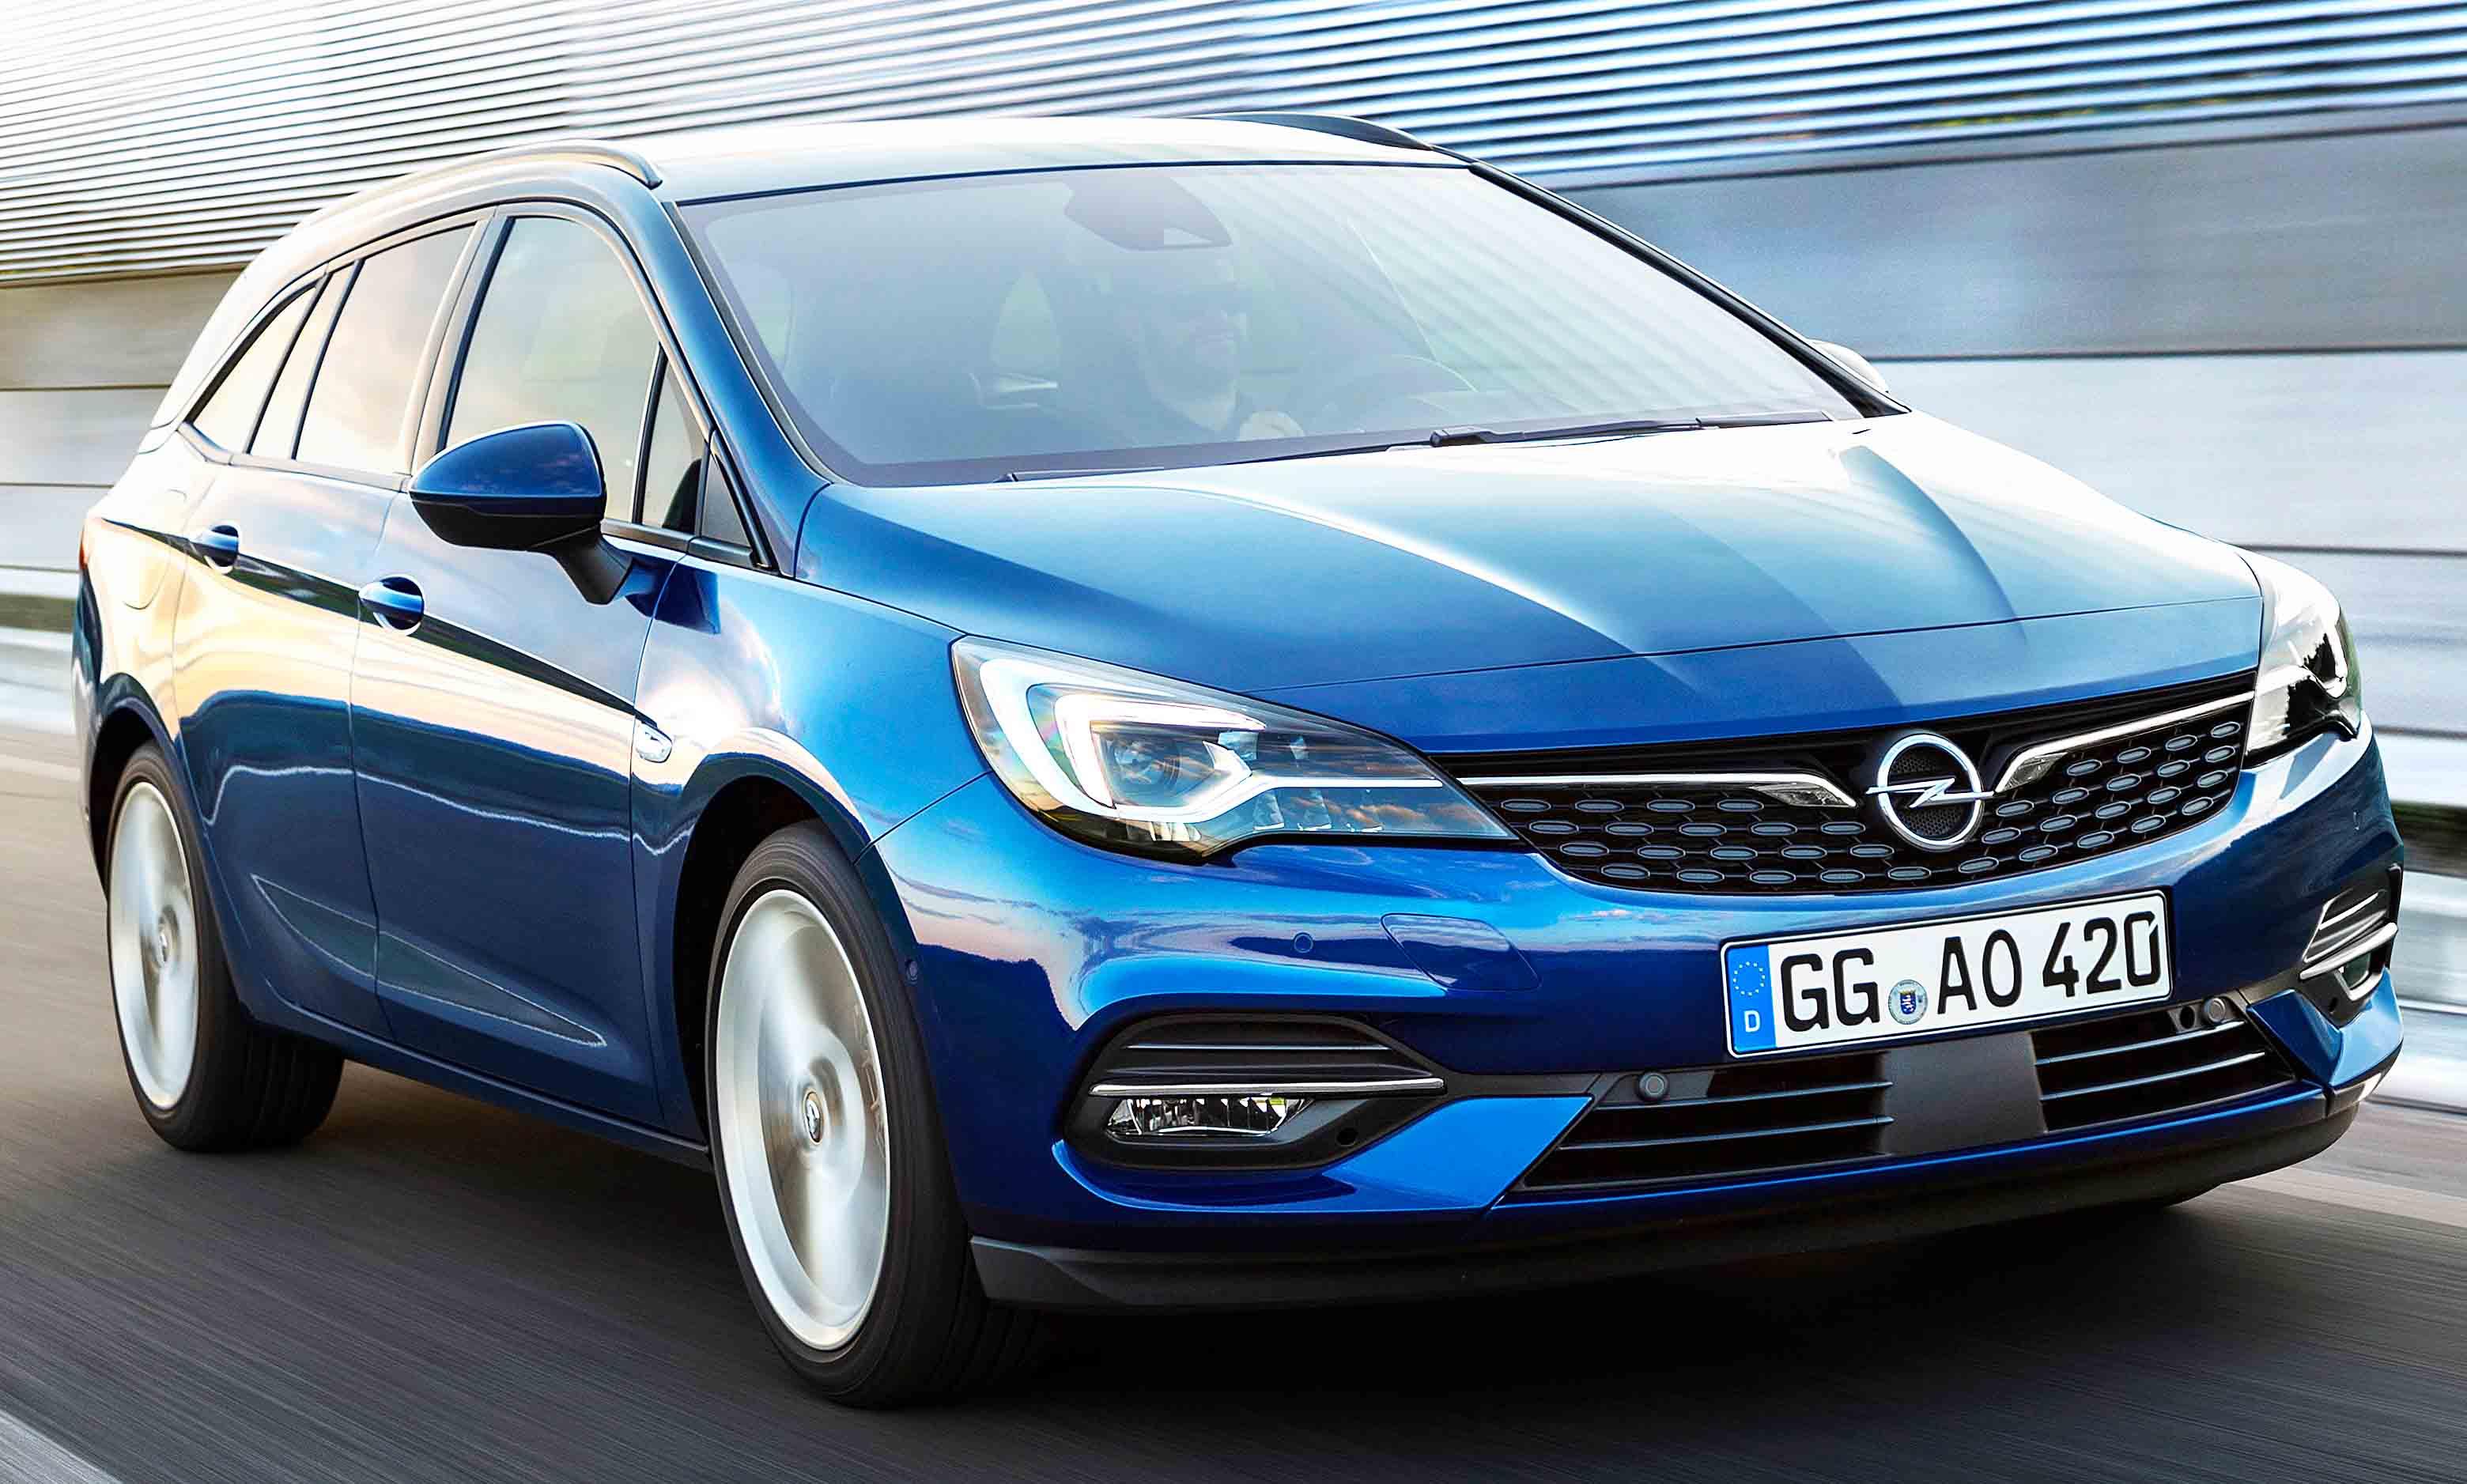 Opel Astra Sports Tourer Facelift 2019 Motoren